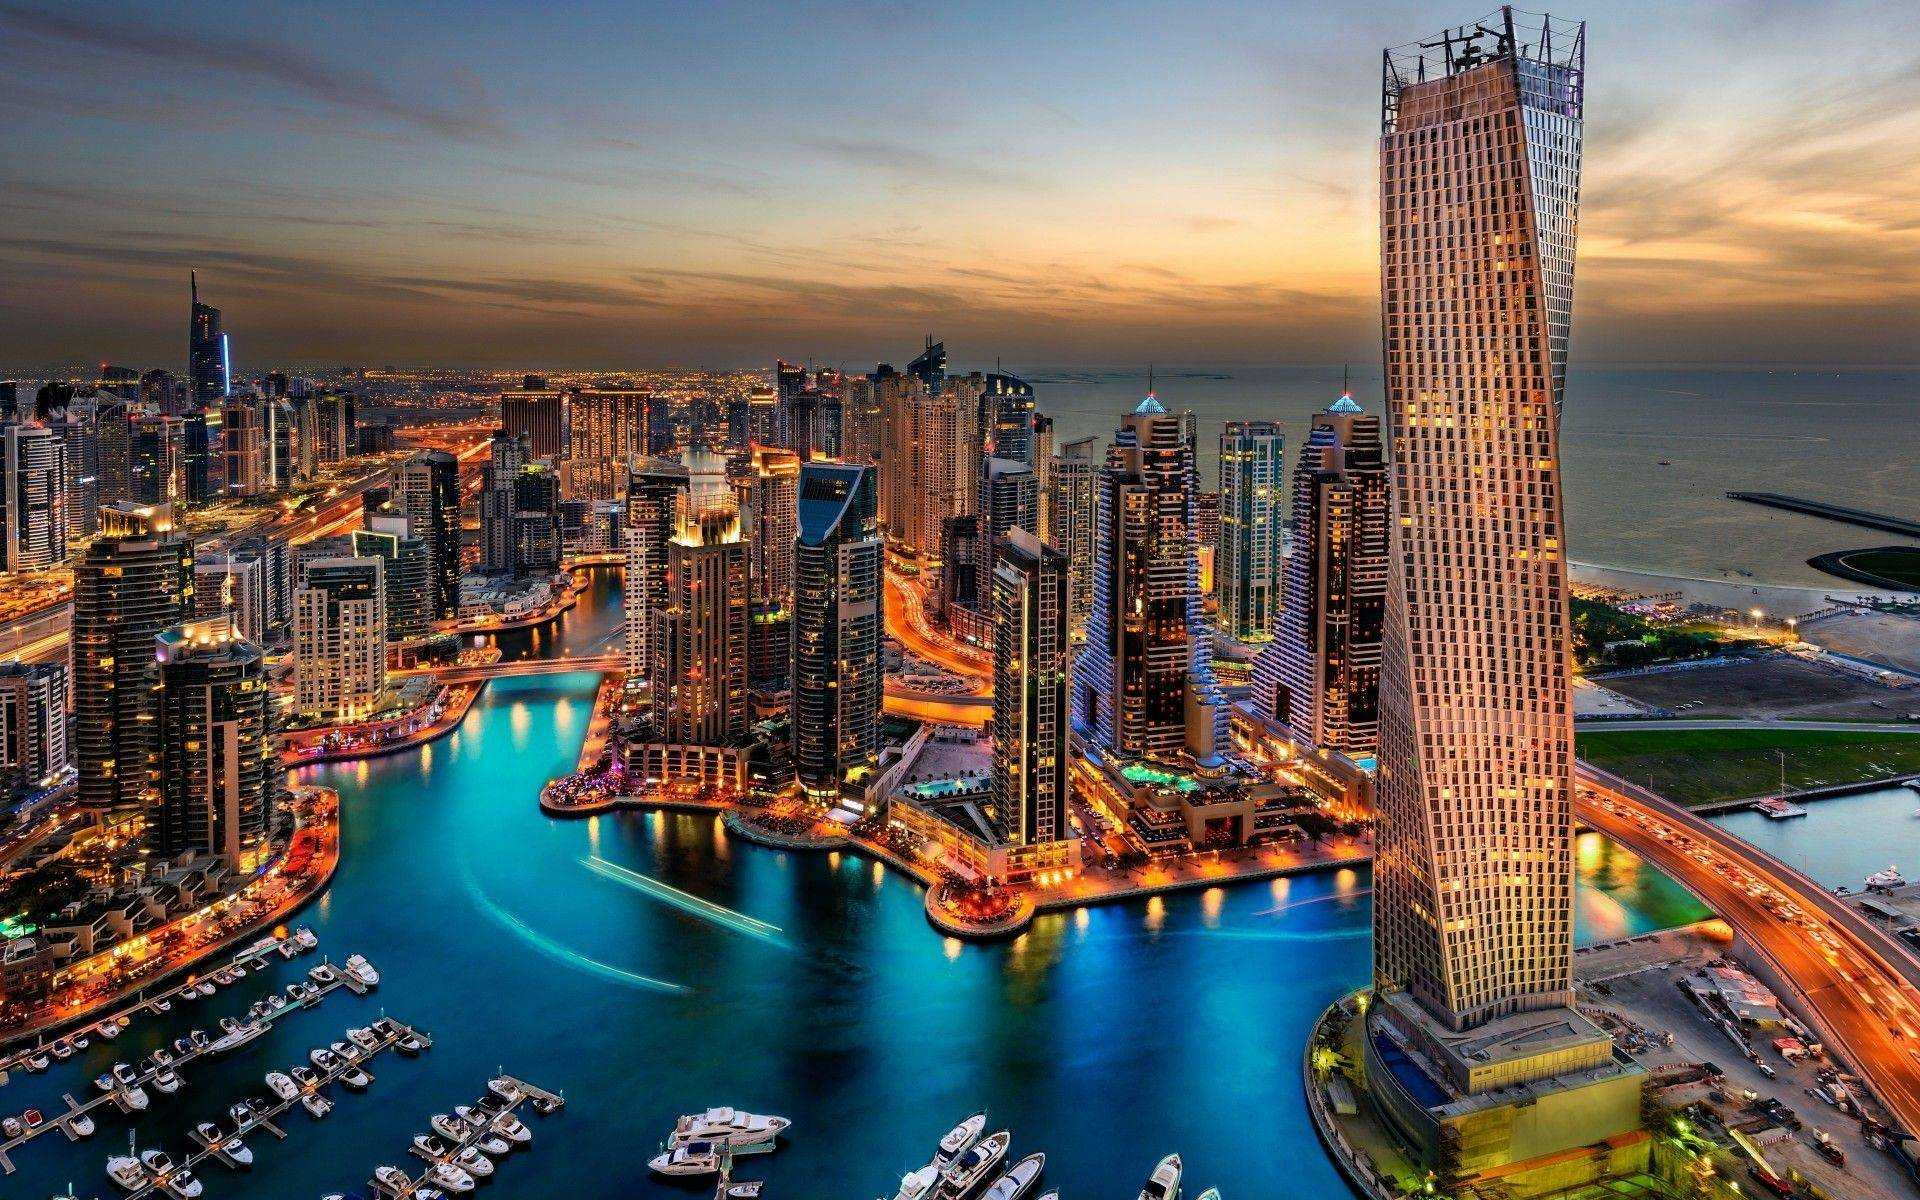 Дубай отдых цены горящие туры москва the green planet дубай